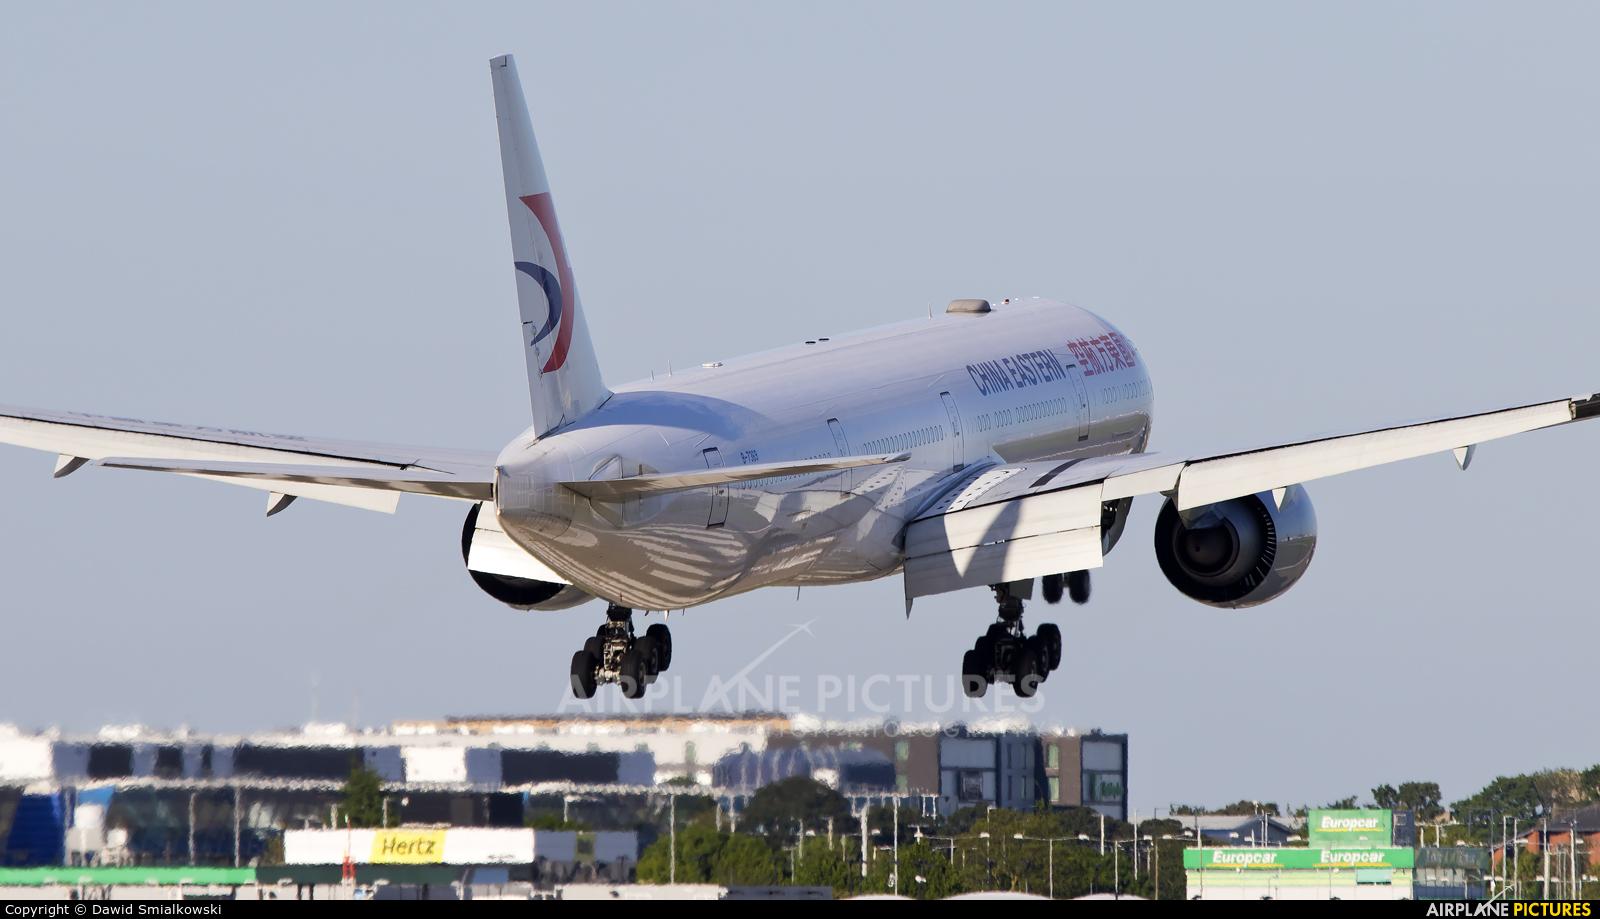 China Eastern Airlines B-7369 aircraft at London - Heathrow